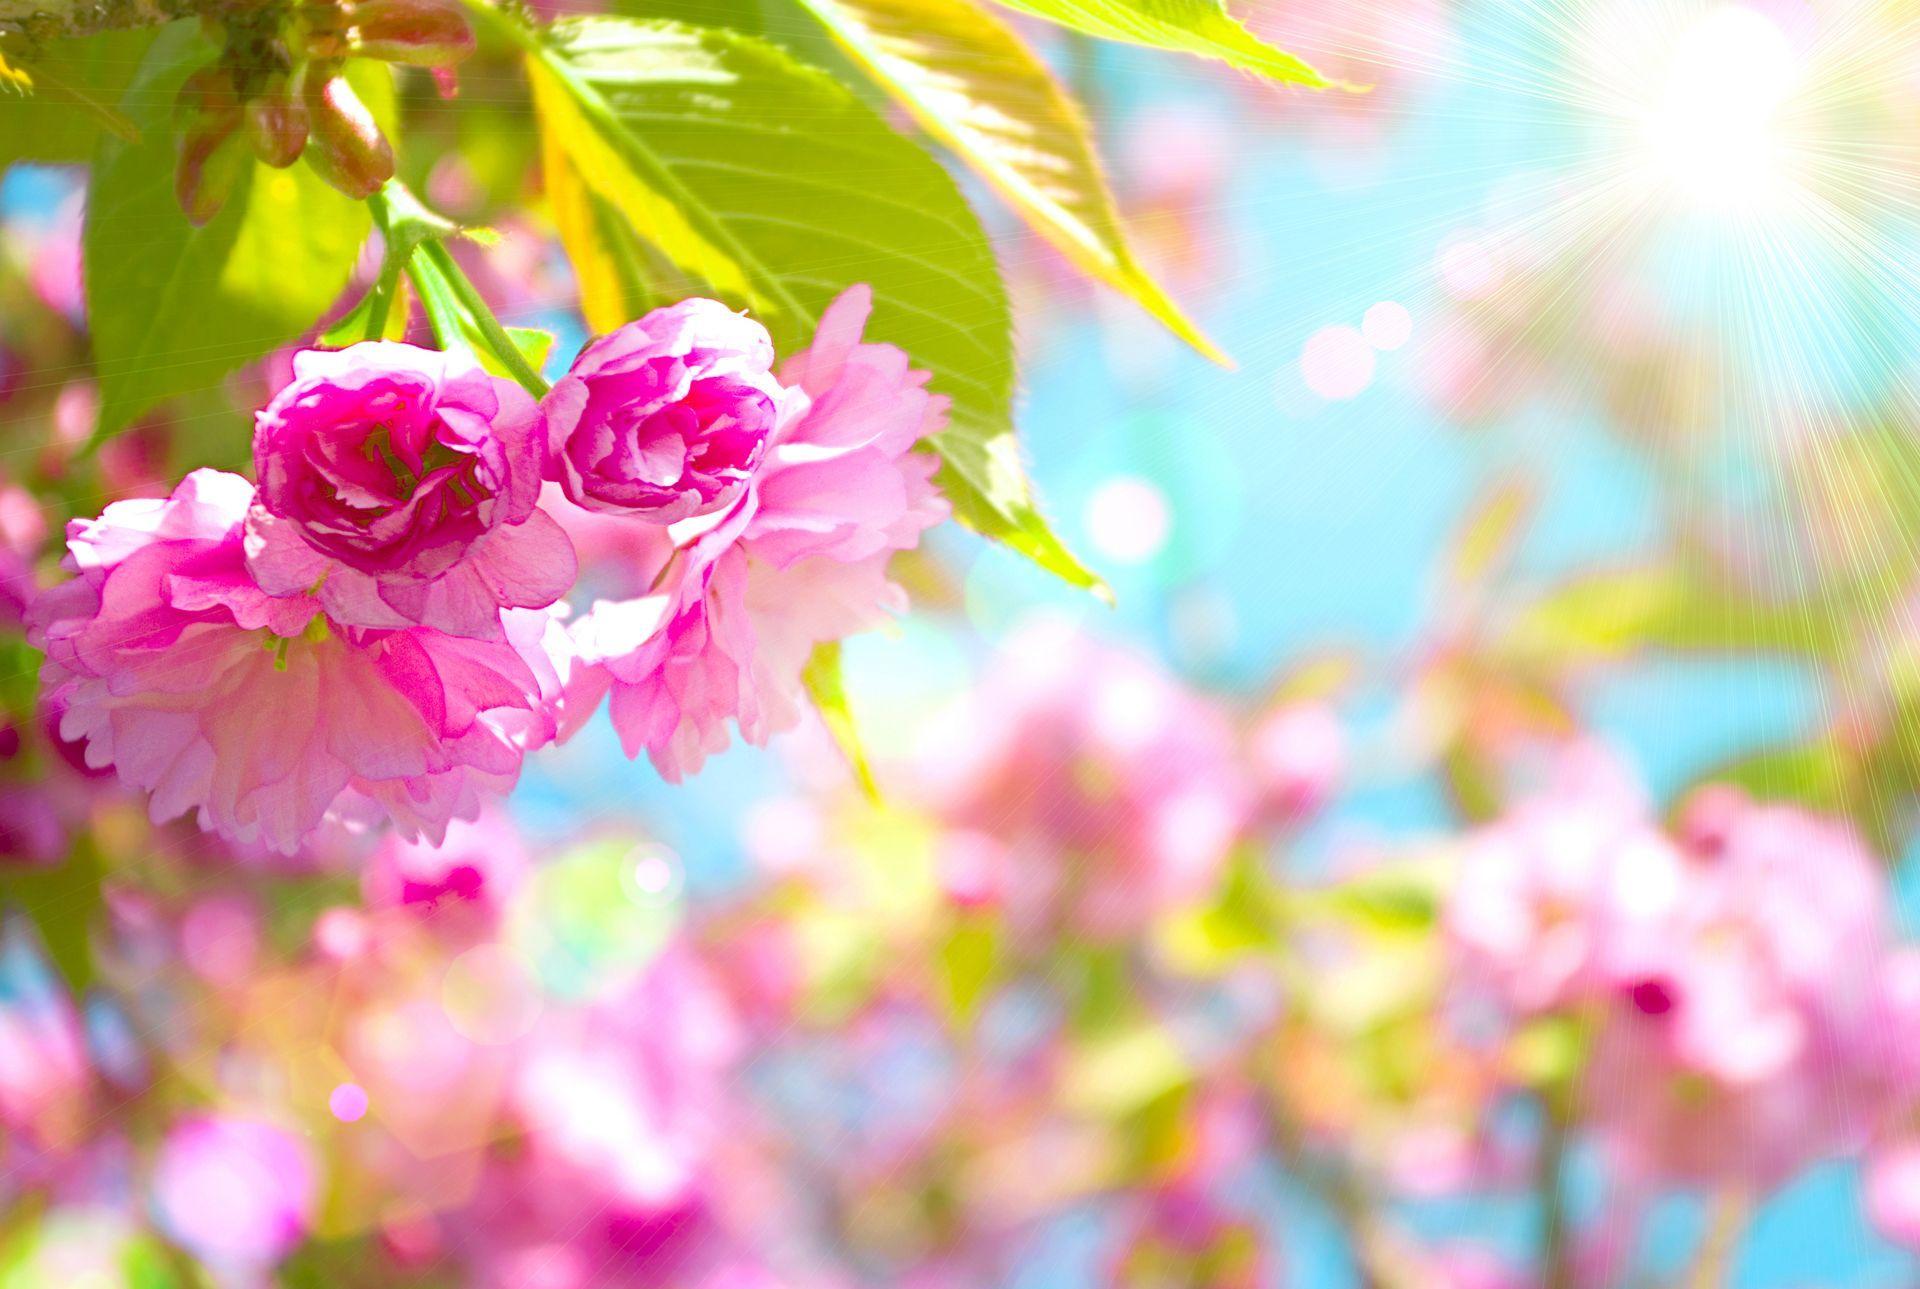 Spring Desktop Wallpapers   Top Spring Desktop Backgrounds 1920x1289